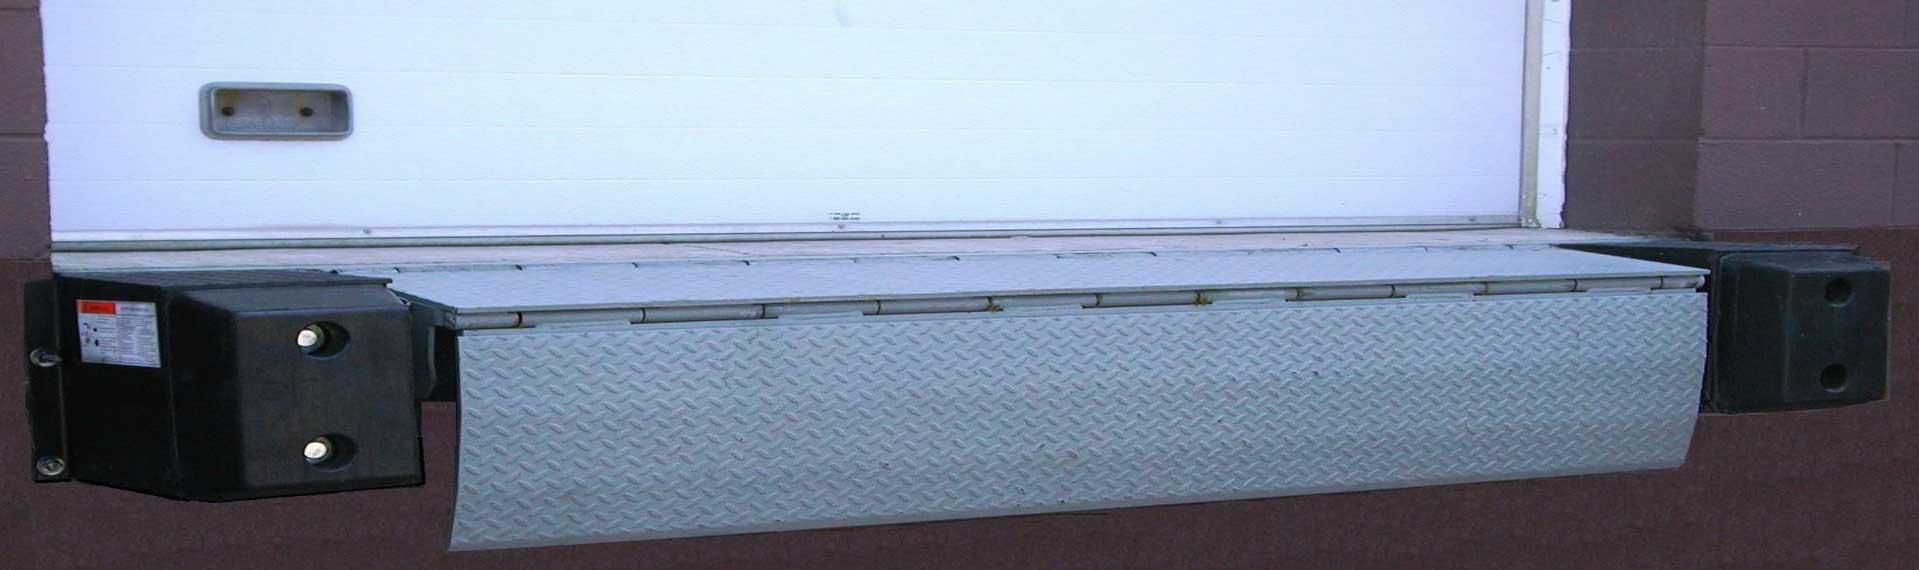 edge of dock